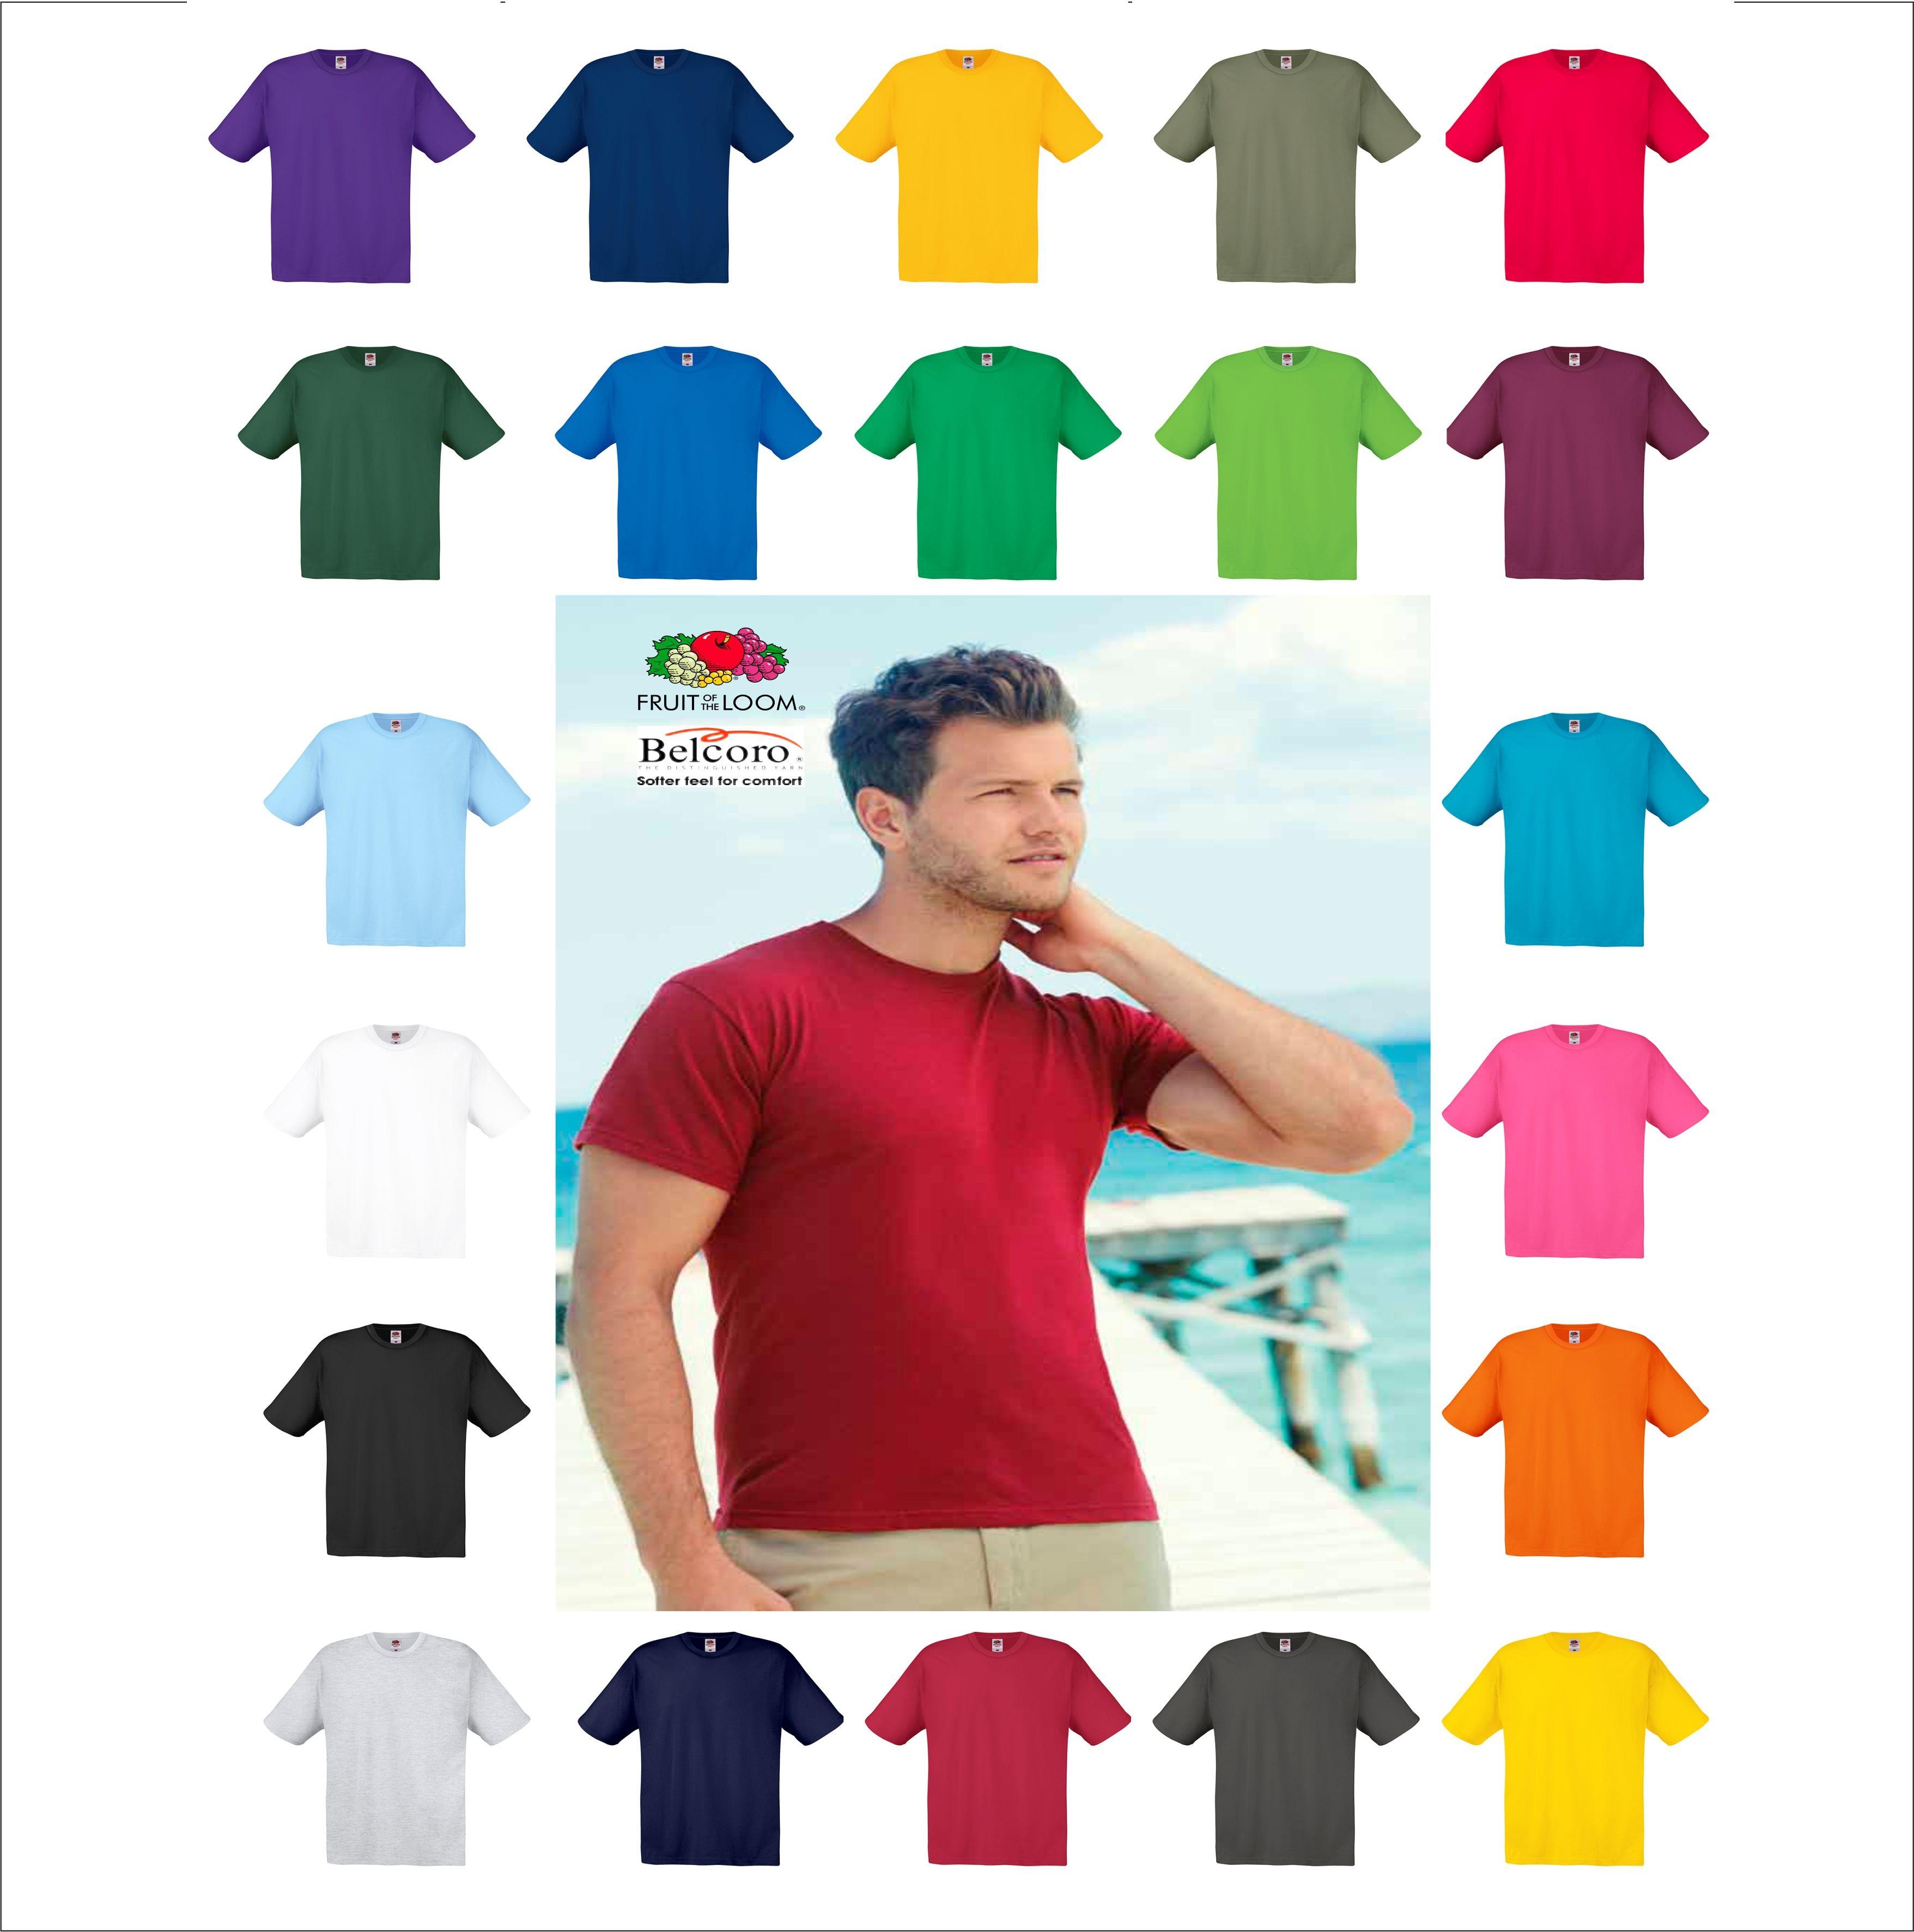 Shirt Tutti Manica Corta The Fruit T Of Loom Uomo Colori Fr61082 I PXikuOZ